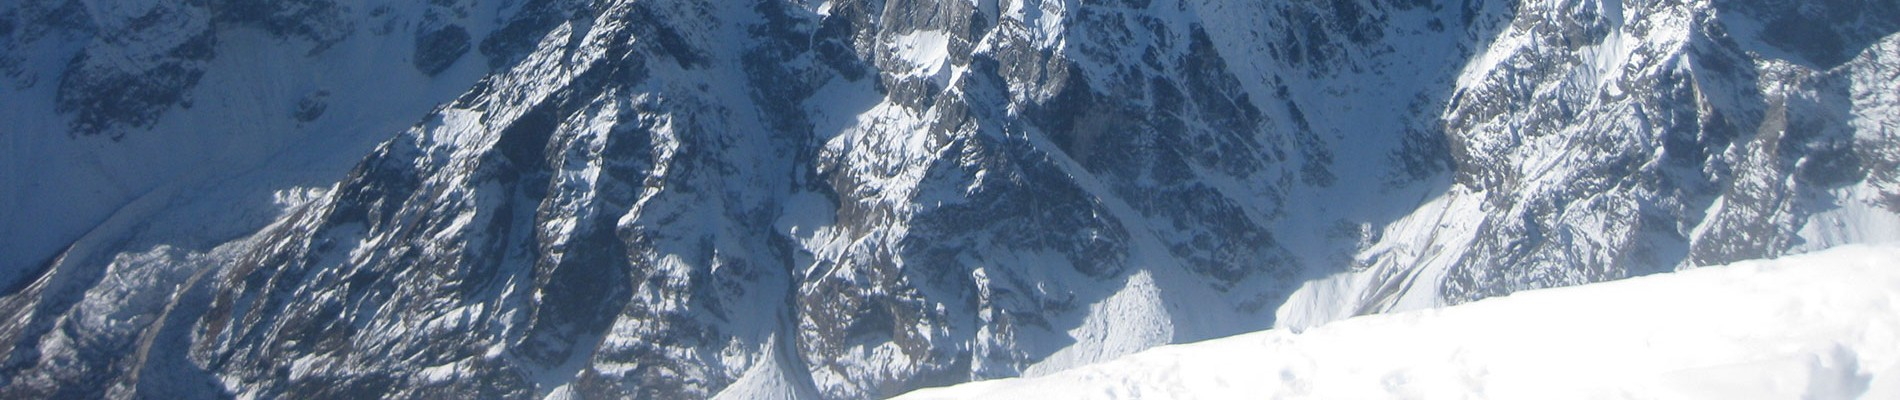 Nepal: 20d Island Peak Climbing